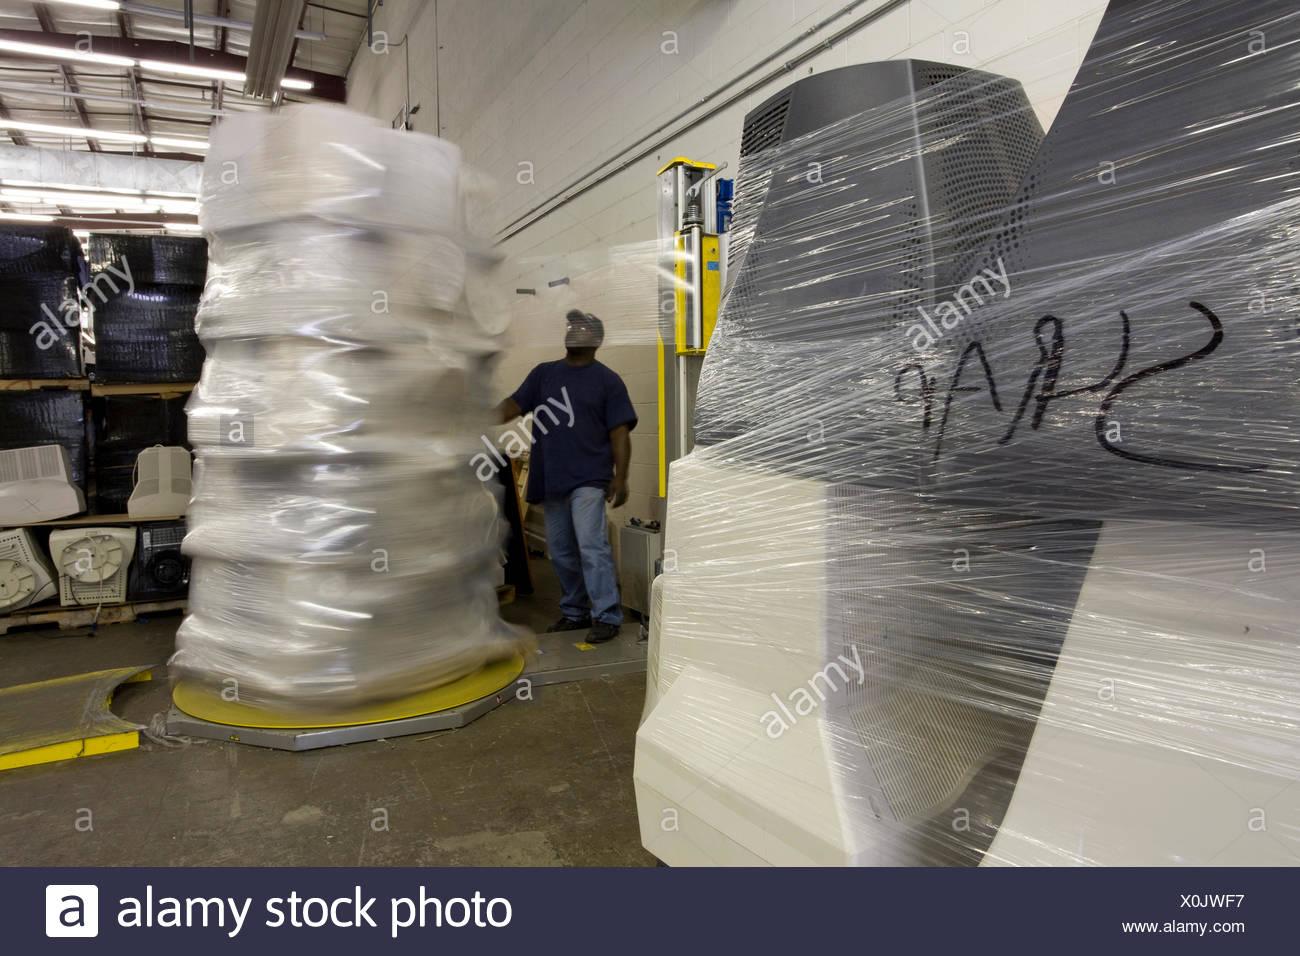 Elecronics Recycler in Salley, South Carolina - Stock Image